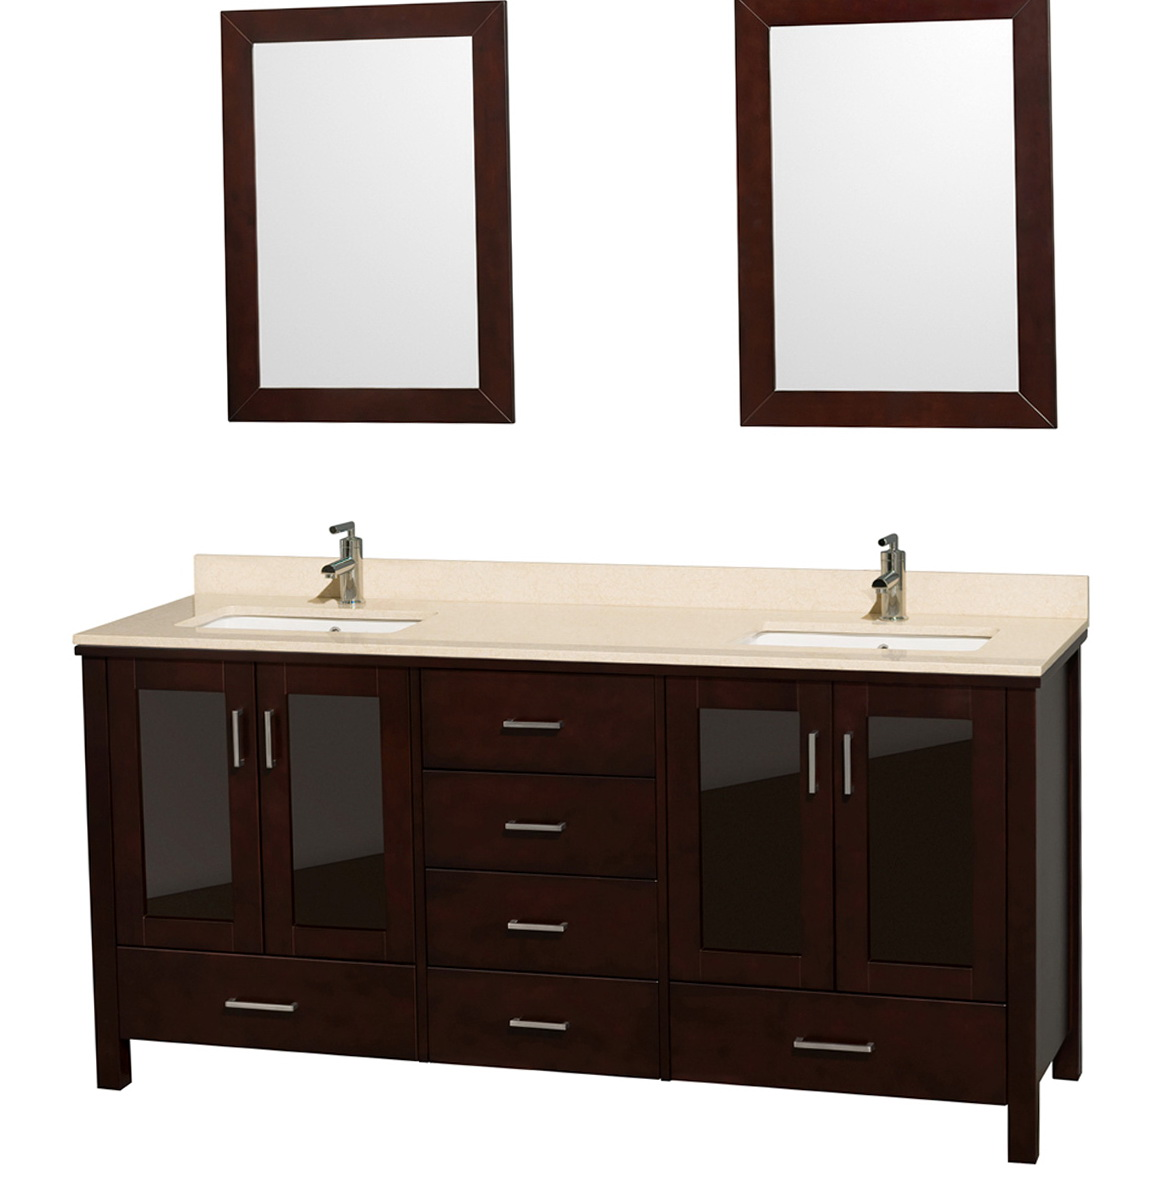 72 Double Vanity Dimensions